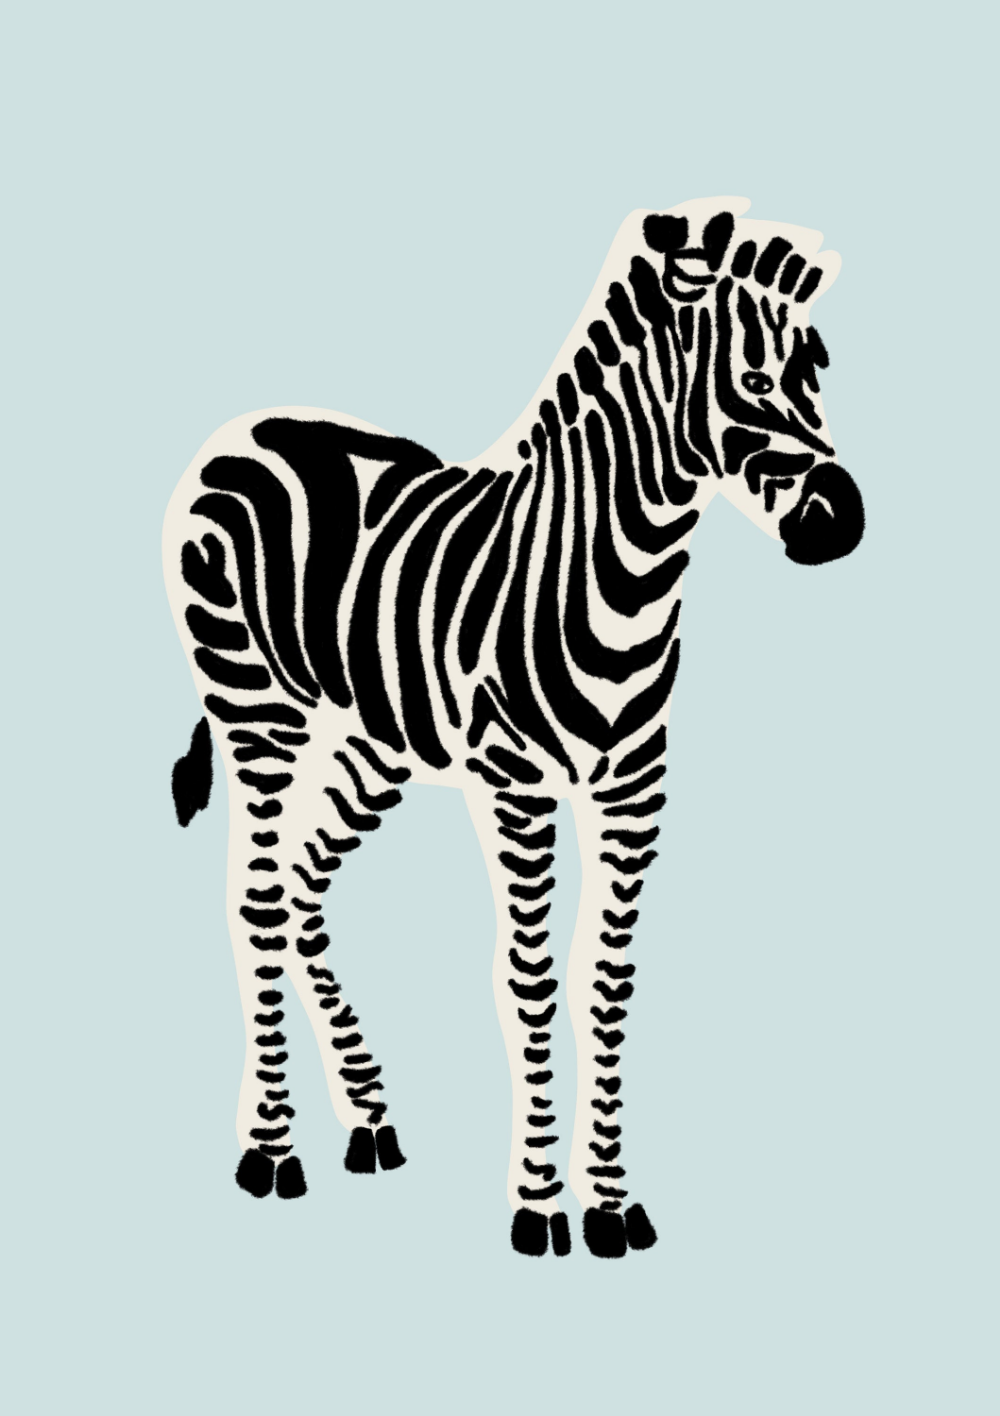 Buy Stencil 6x6 Zebra Print Zebra Print Stencil Template